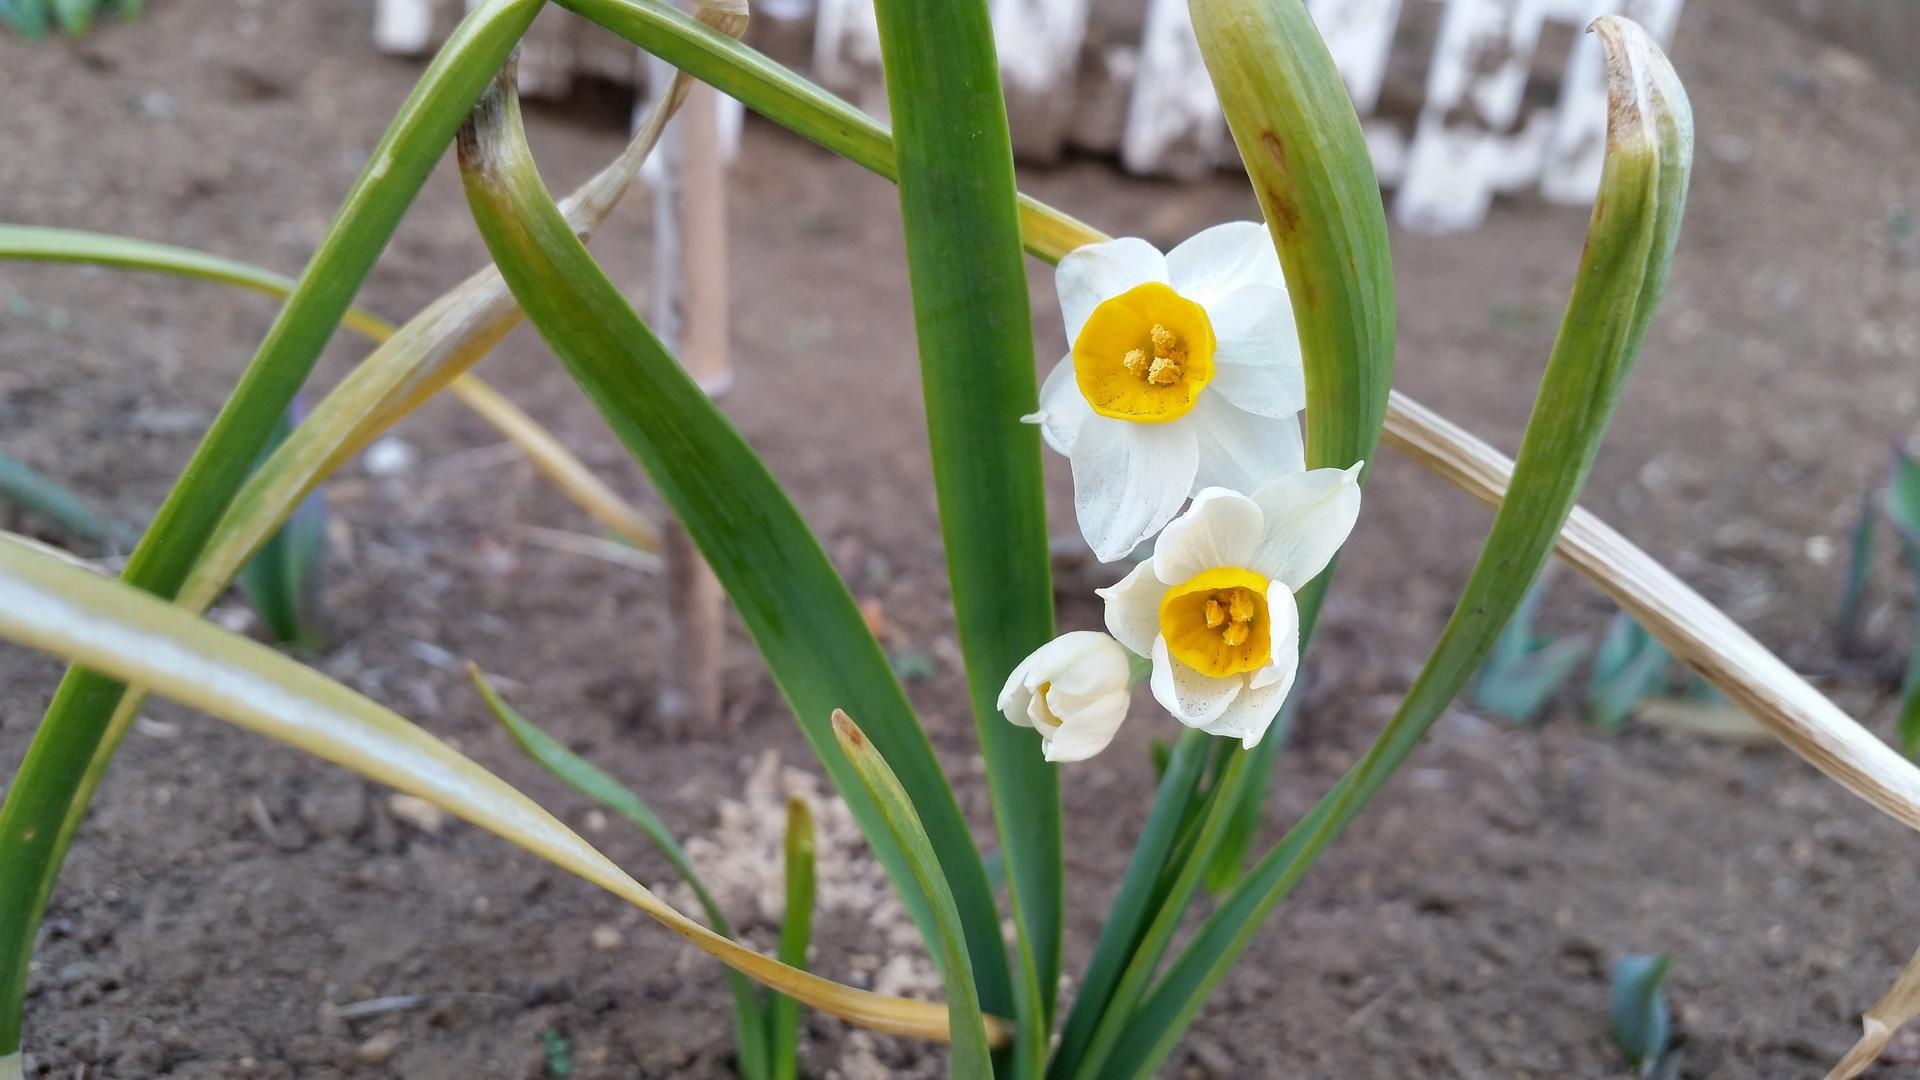 spring is coming soon! | present4_u, flora, flower, garden